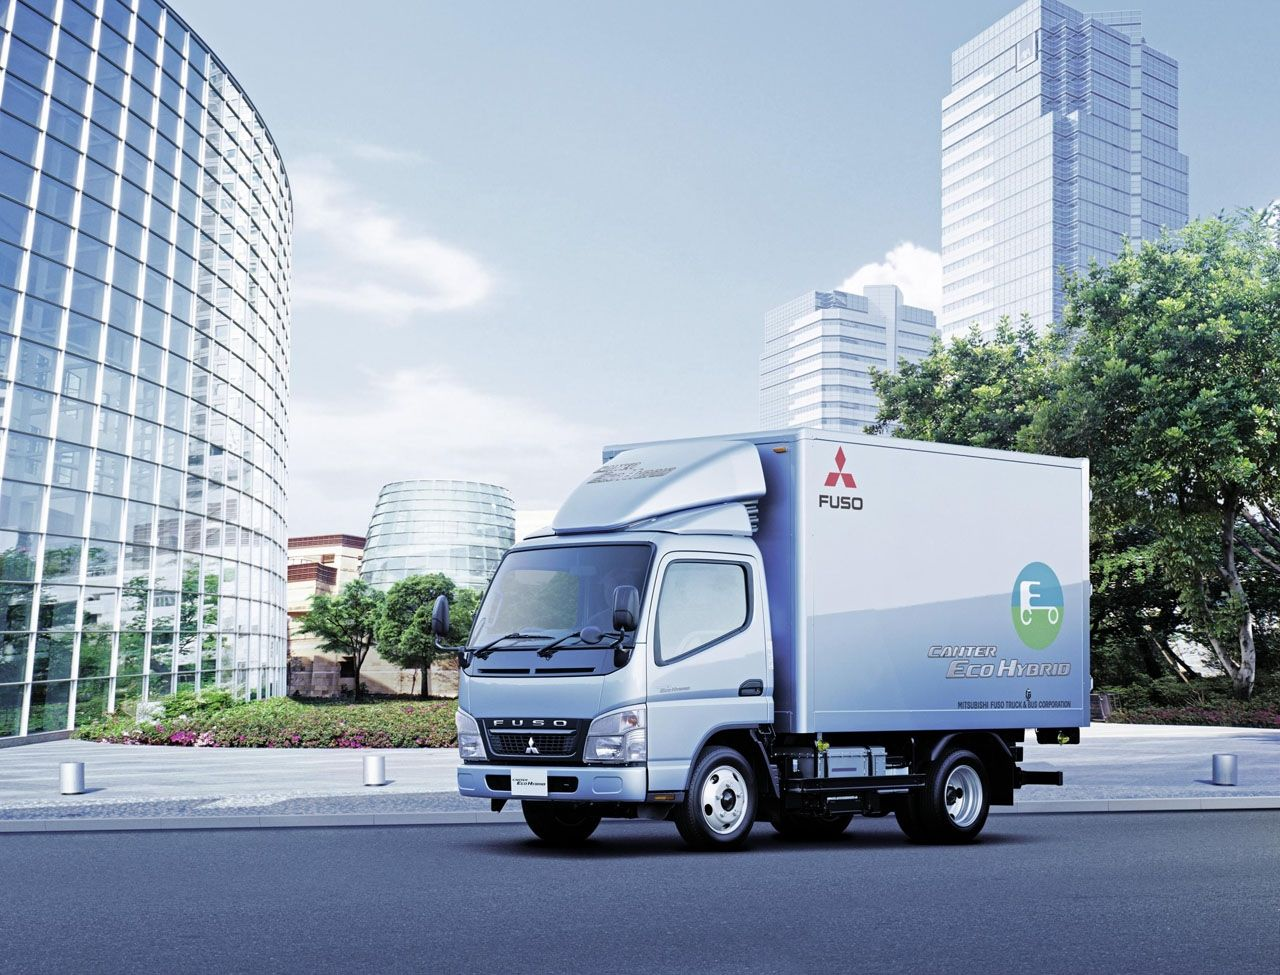 Fleet facelift: DHL Hong Kong buys its first-ever green truck for transport